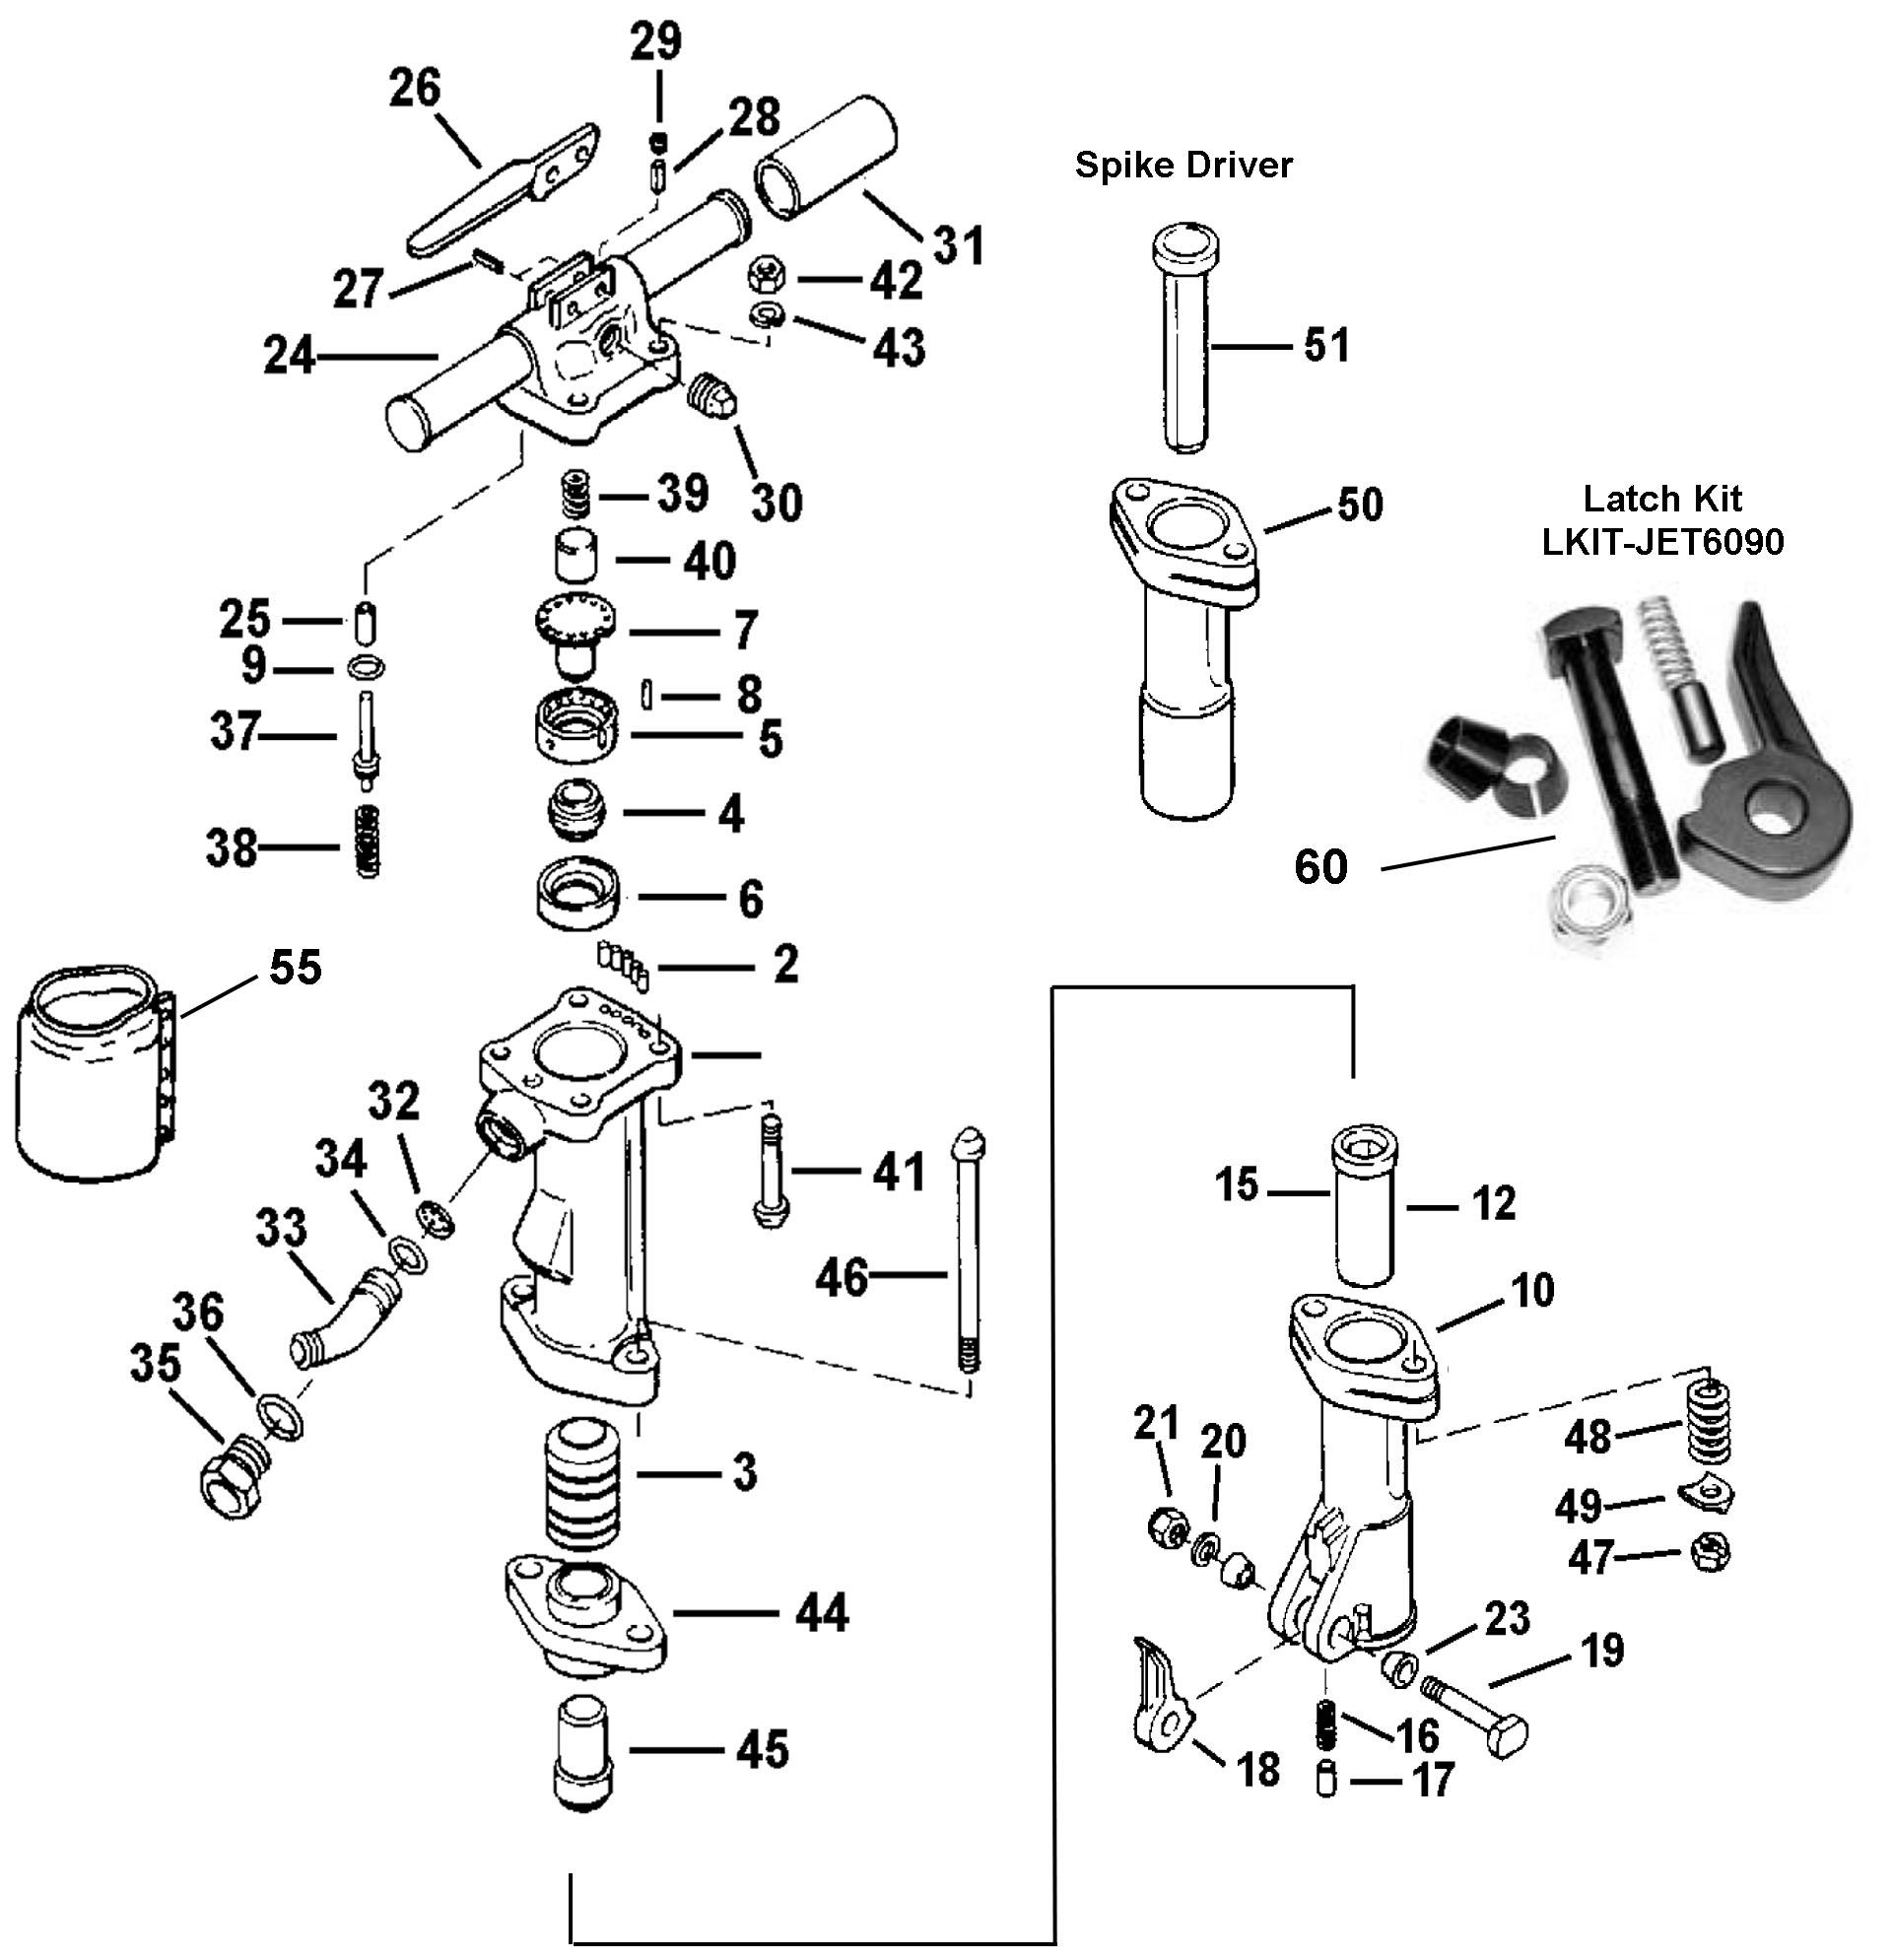 PB-90 Paving Breaker (90lb) | Page 1 of 1 on pressure regulator schematic, rpd schematic, bulldozer schematic, pressure washer schematic, boost pedal schematic, generator schematic, excavator schematic, aqueduct schematic, bobcat schematic, trailer schematic, flashlight schematic, overdrive schematic, computer schematic, compressor schematic, ak-47 schematic, backhoe schematic, m4 schematic, simple distortion pedal schematic, joystick schematic, paver schematic,